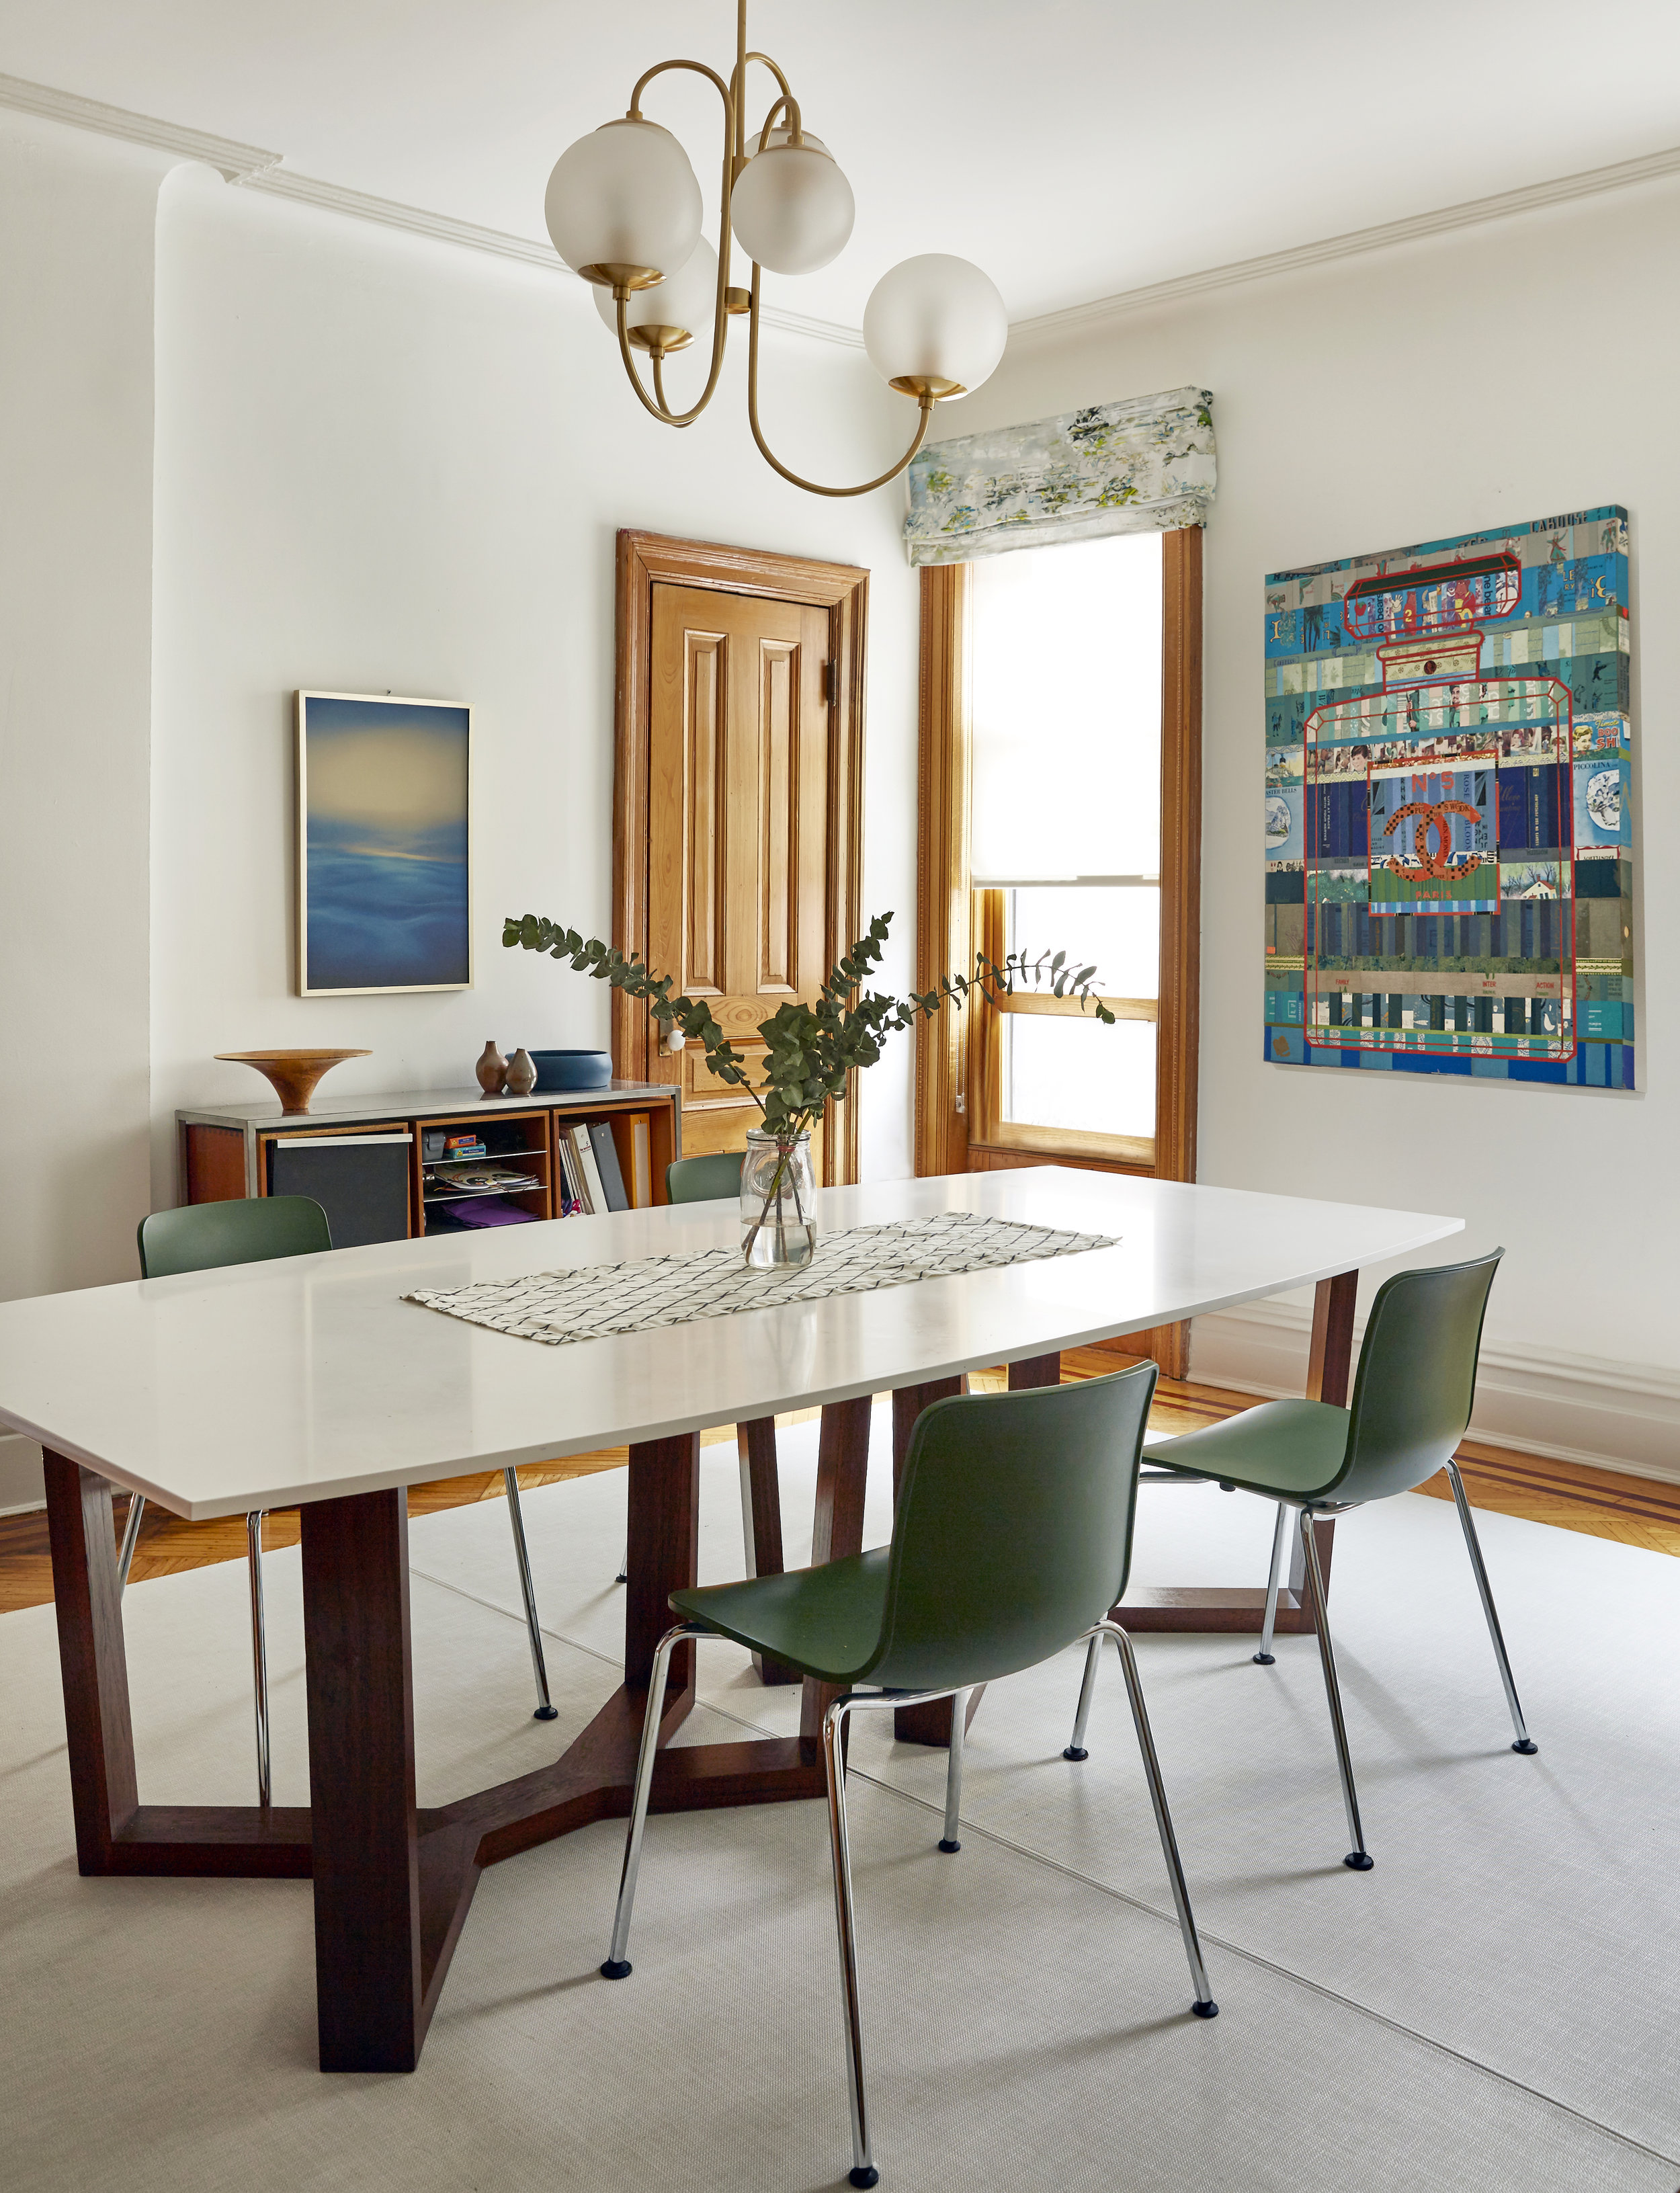 Funky Chanel Collage Dining Room West Elm JMorris Design Interior Designer Brooklyn New York